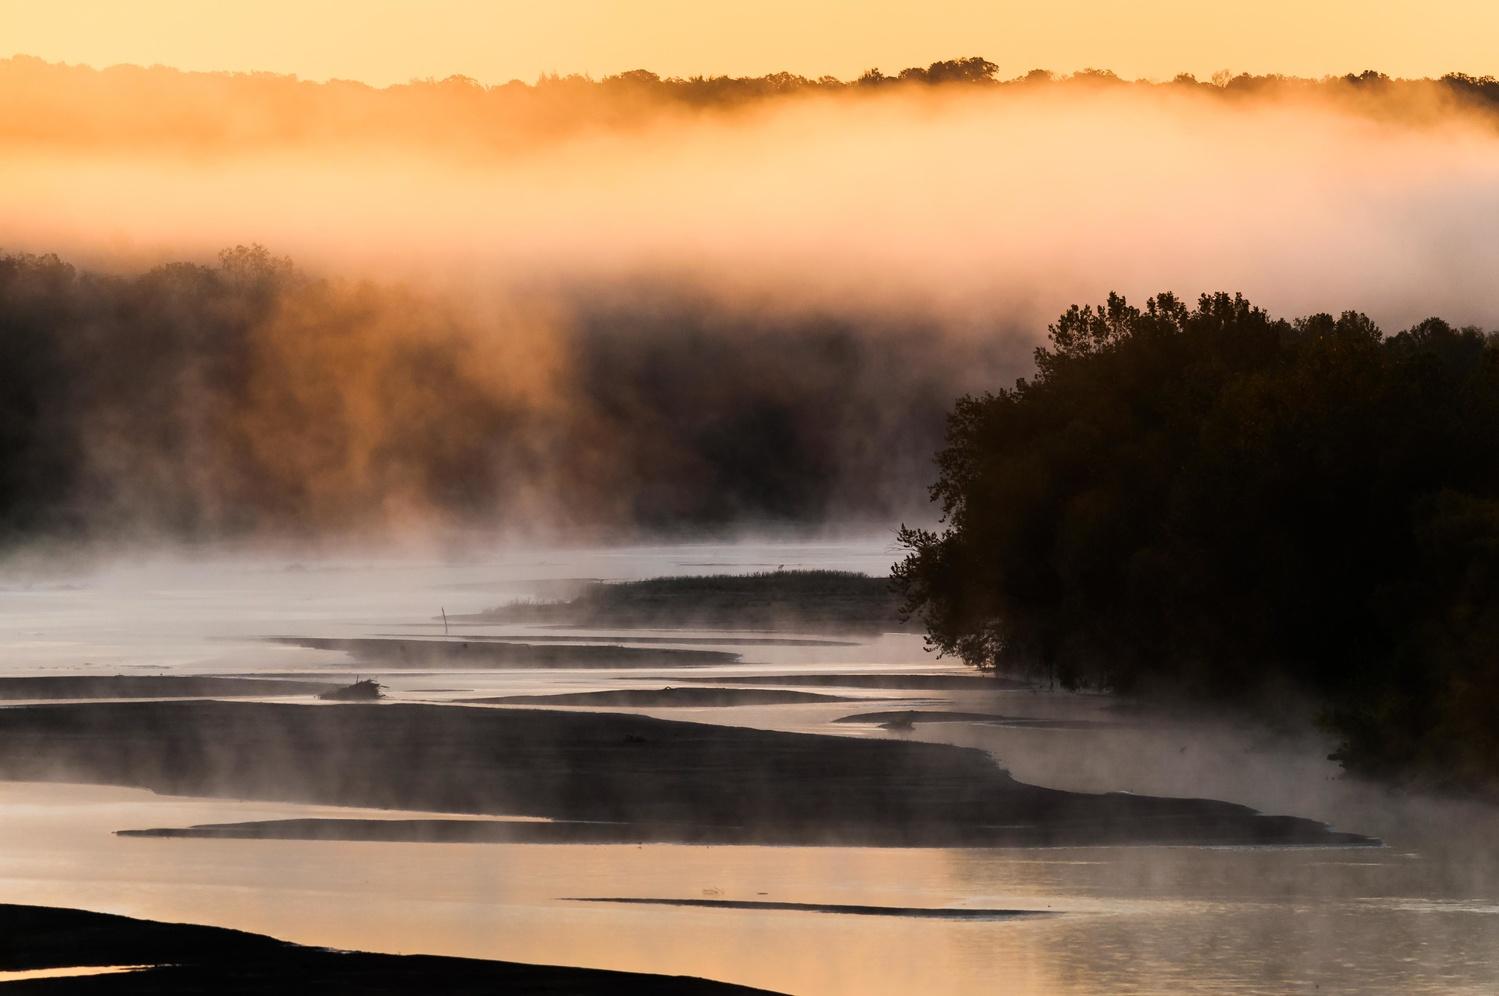 Canadian River near Konawa, Oklahoma by Richard Barron